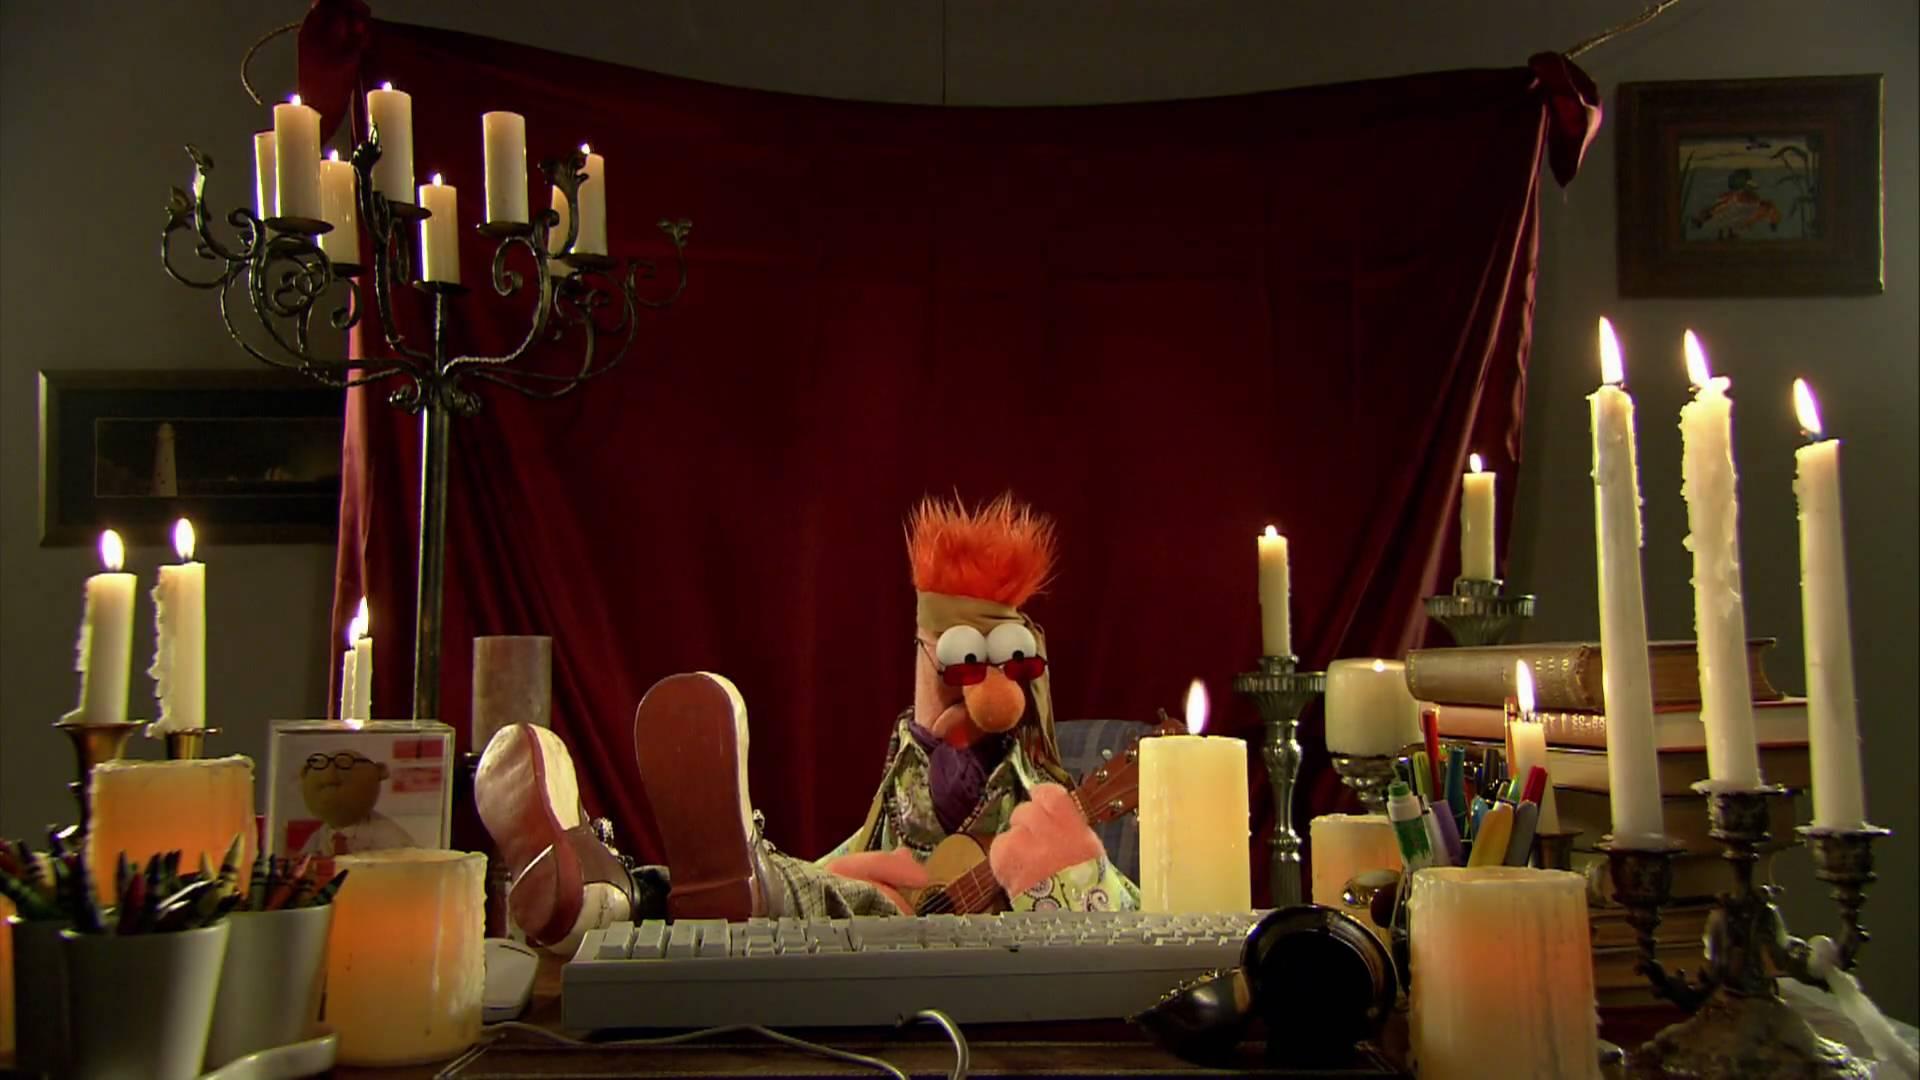 The Muppets: Beaker's Ballad 1